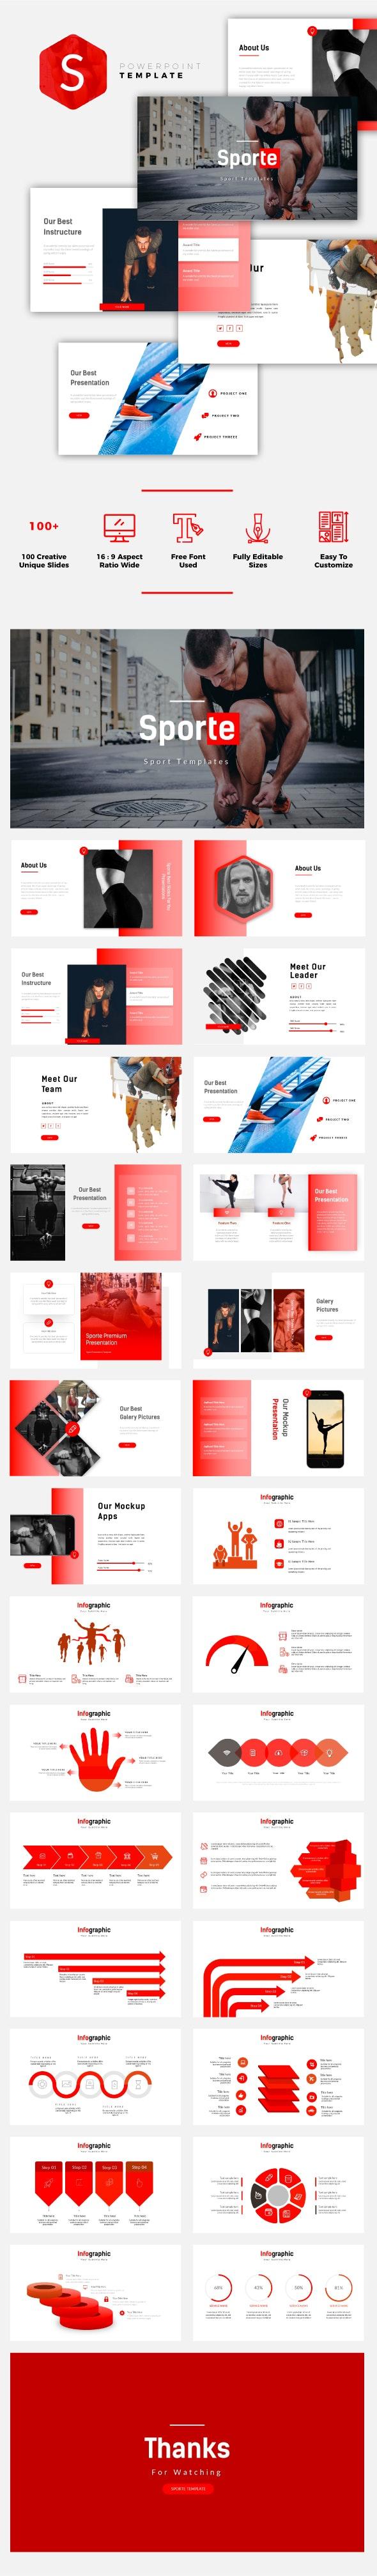 Sporte - Sport PowerPoint Template - Miscellaneous PowerPoint Templates